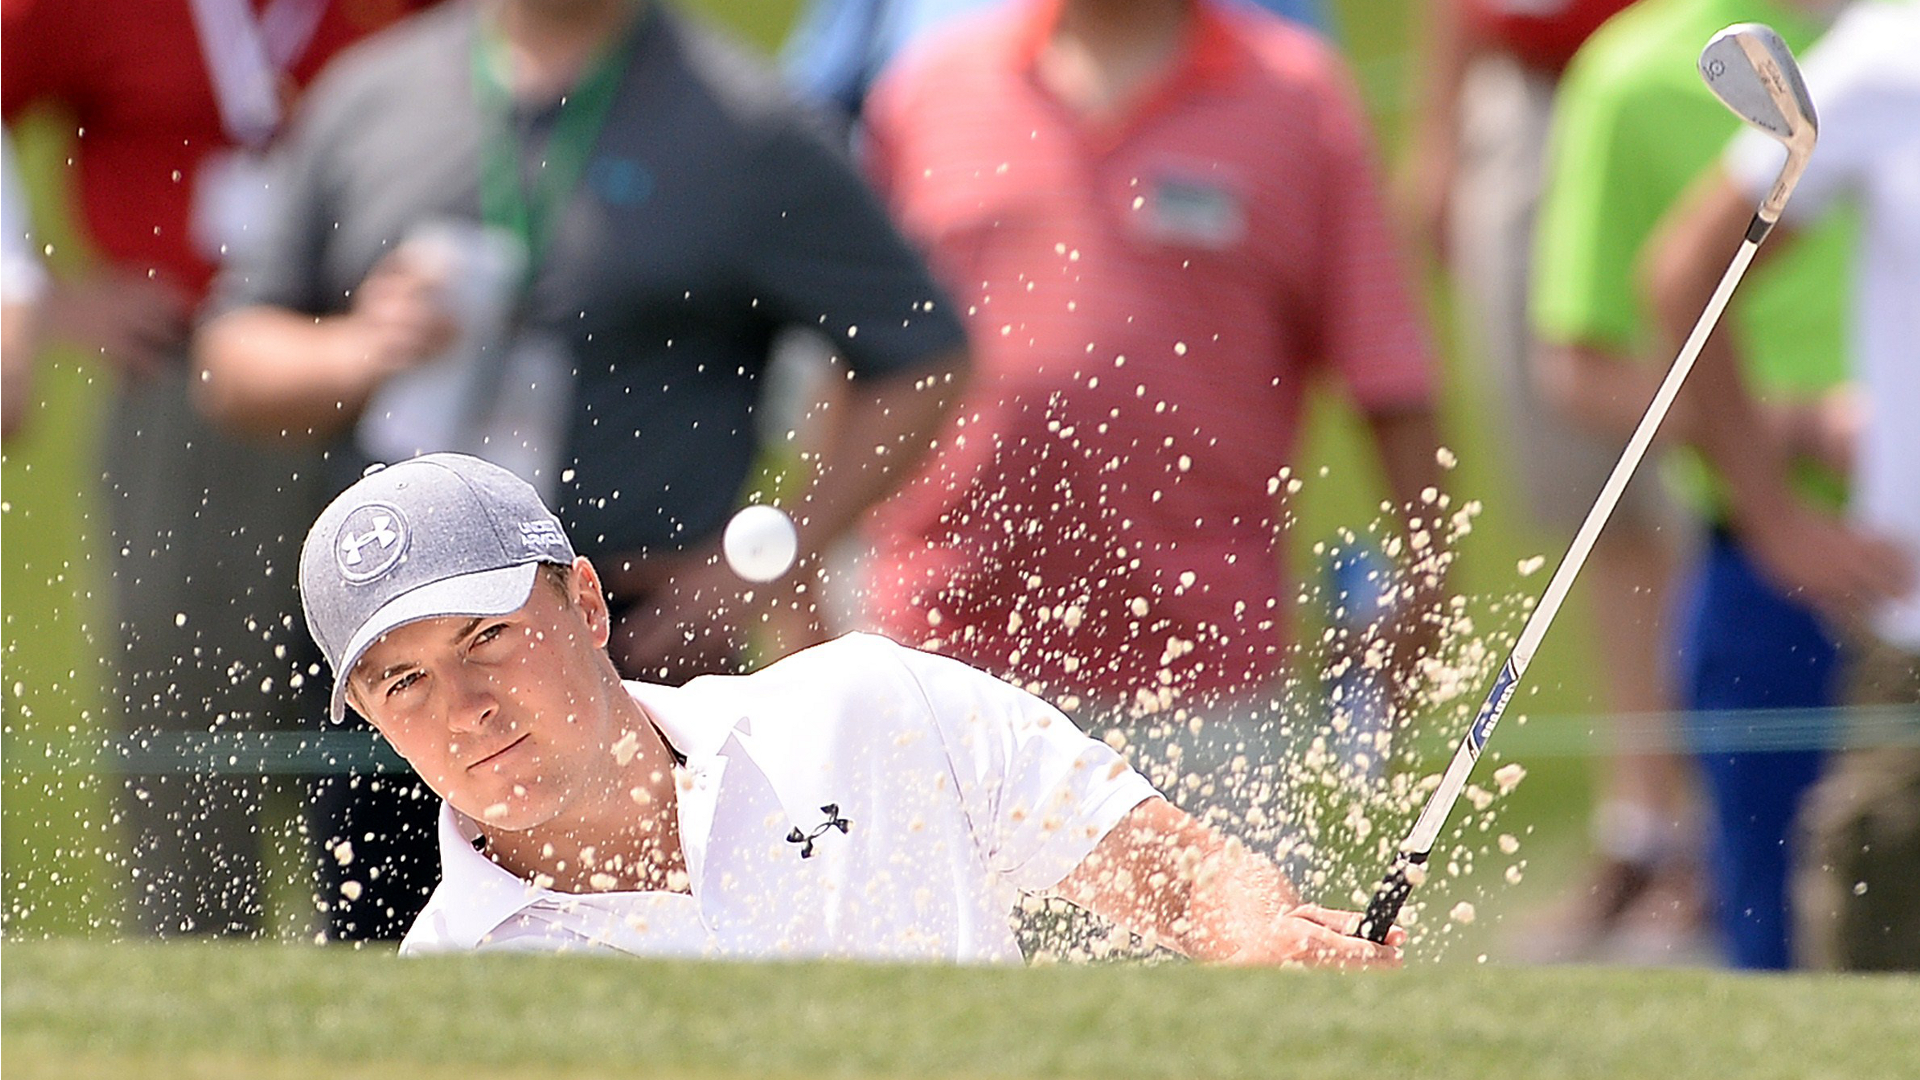 aaf08961 http://www.golfchannel.com/media?guid ...